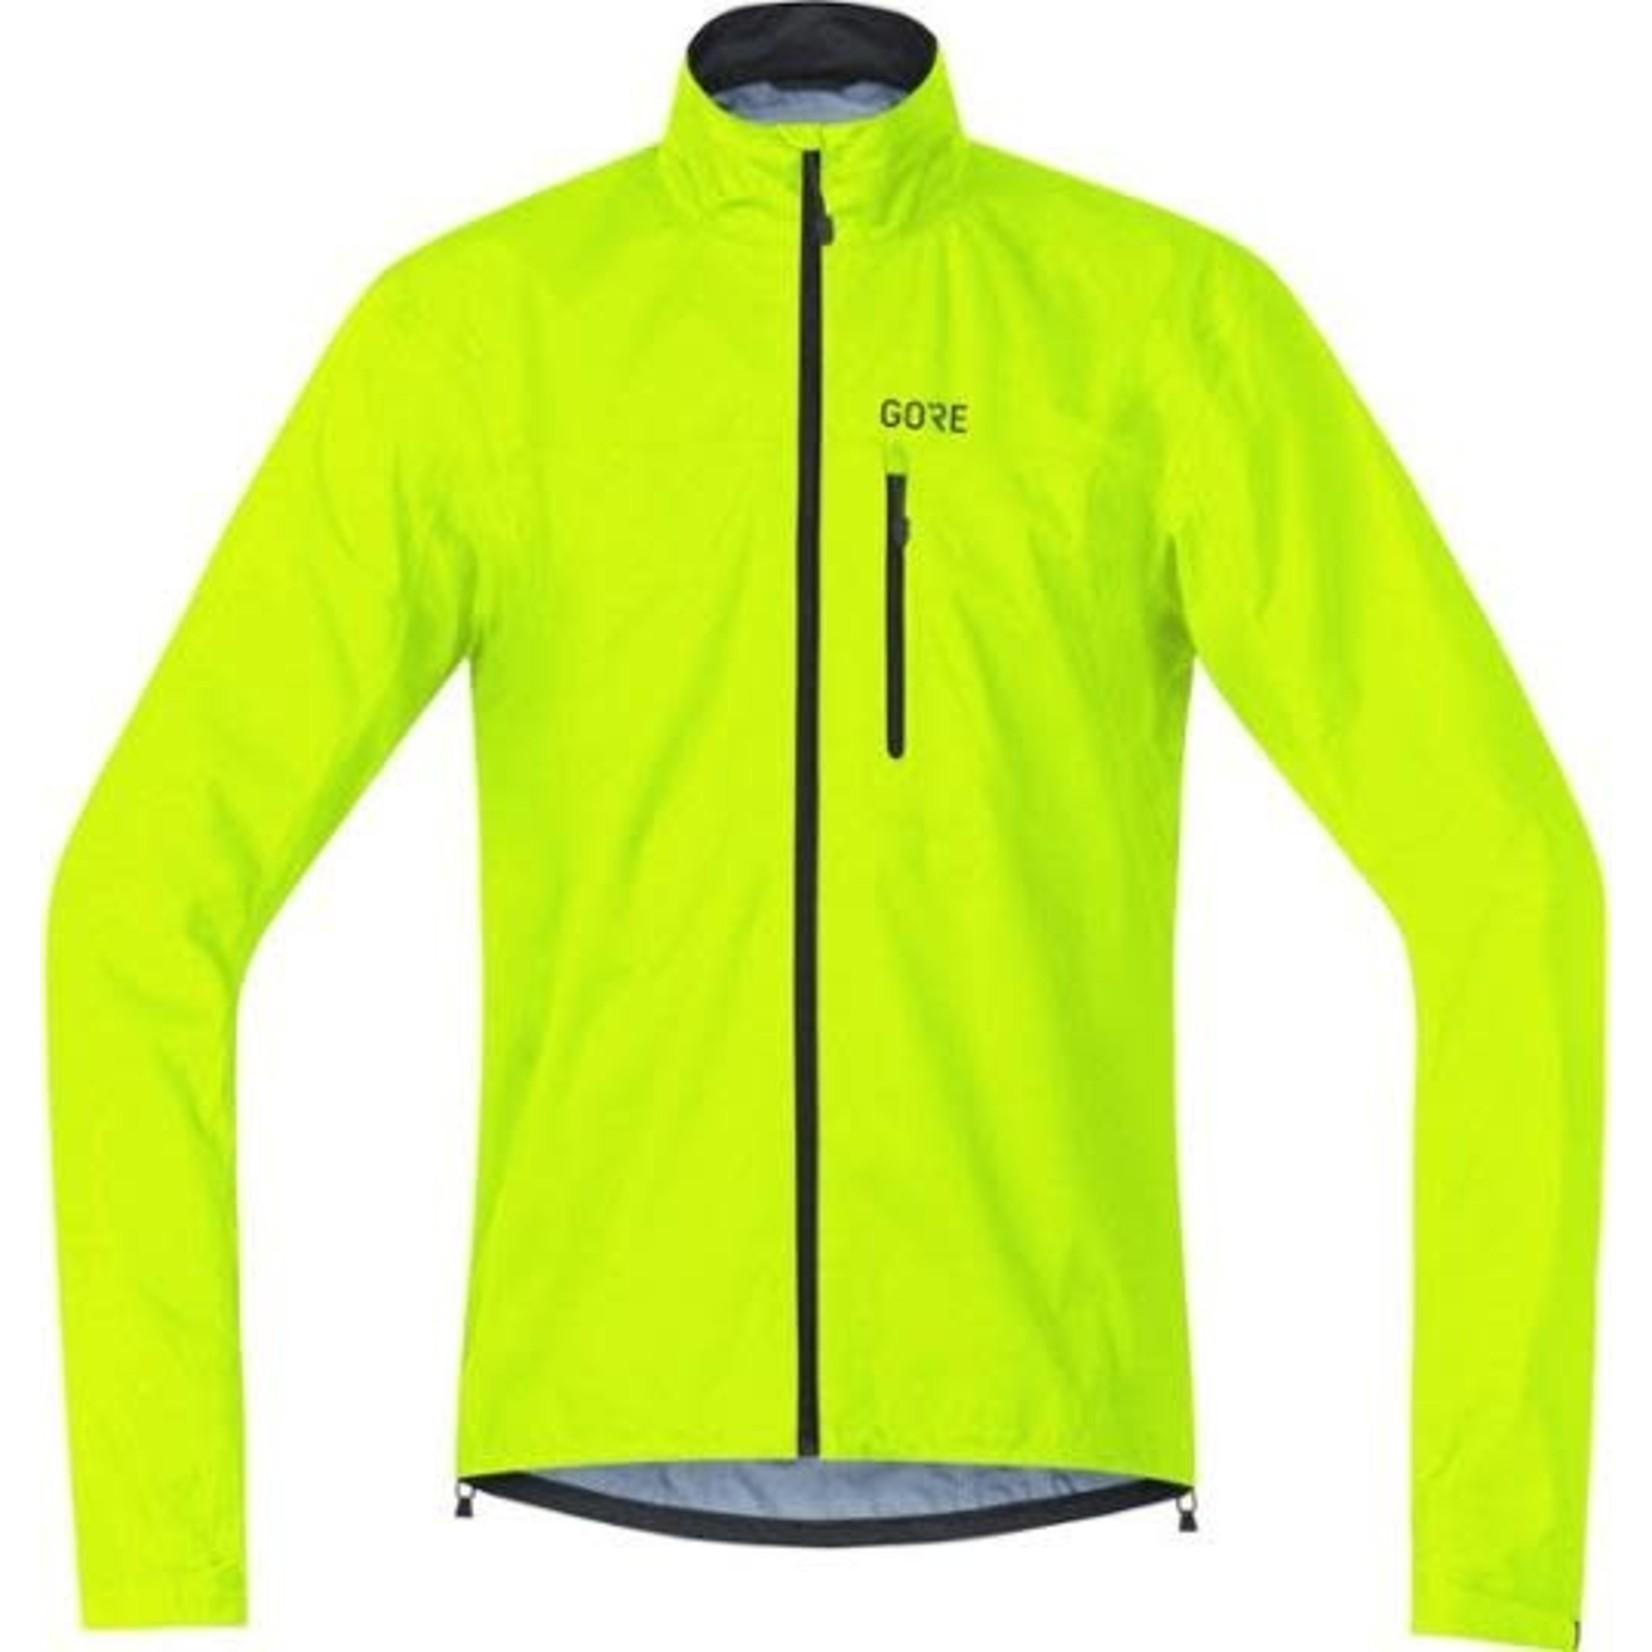 GORE Wear GORE C3 GORE-TEX Active Jacket